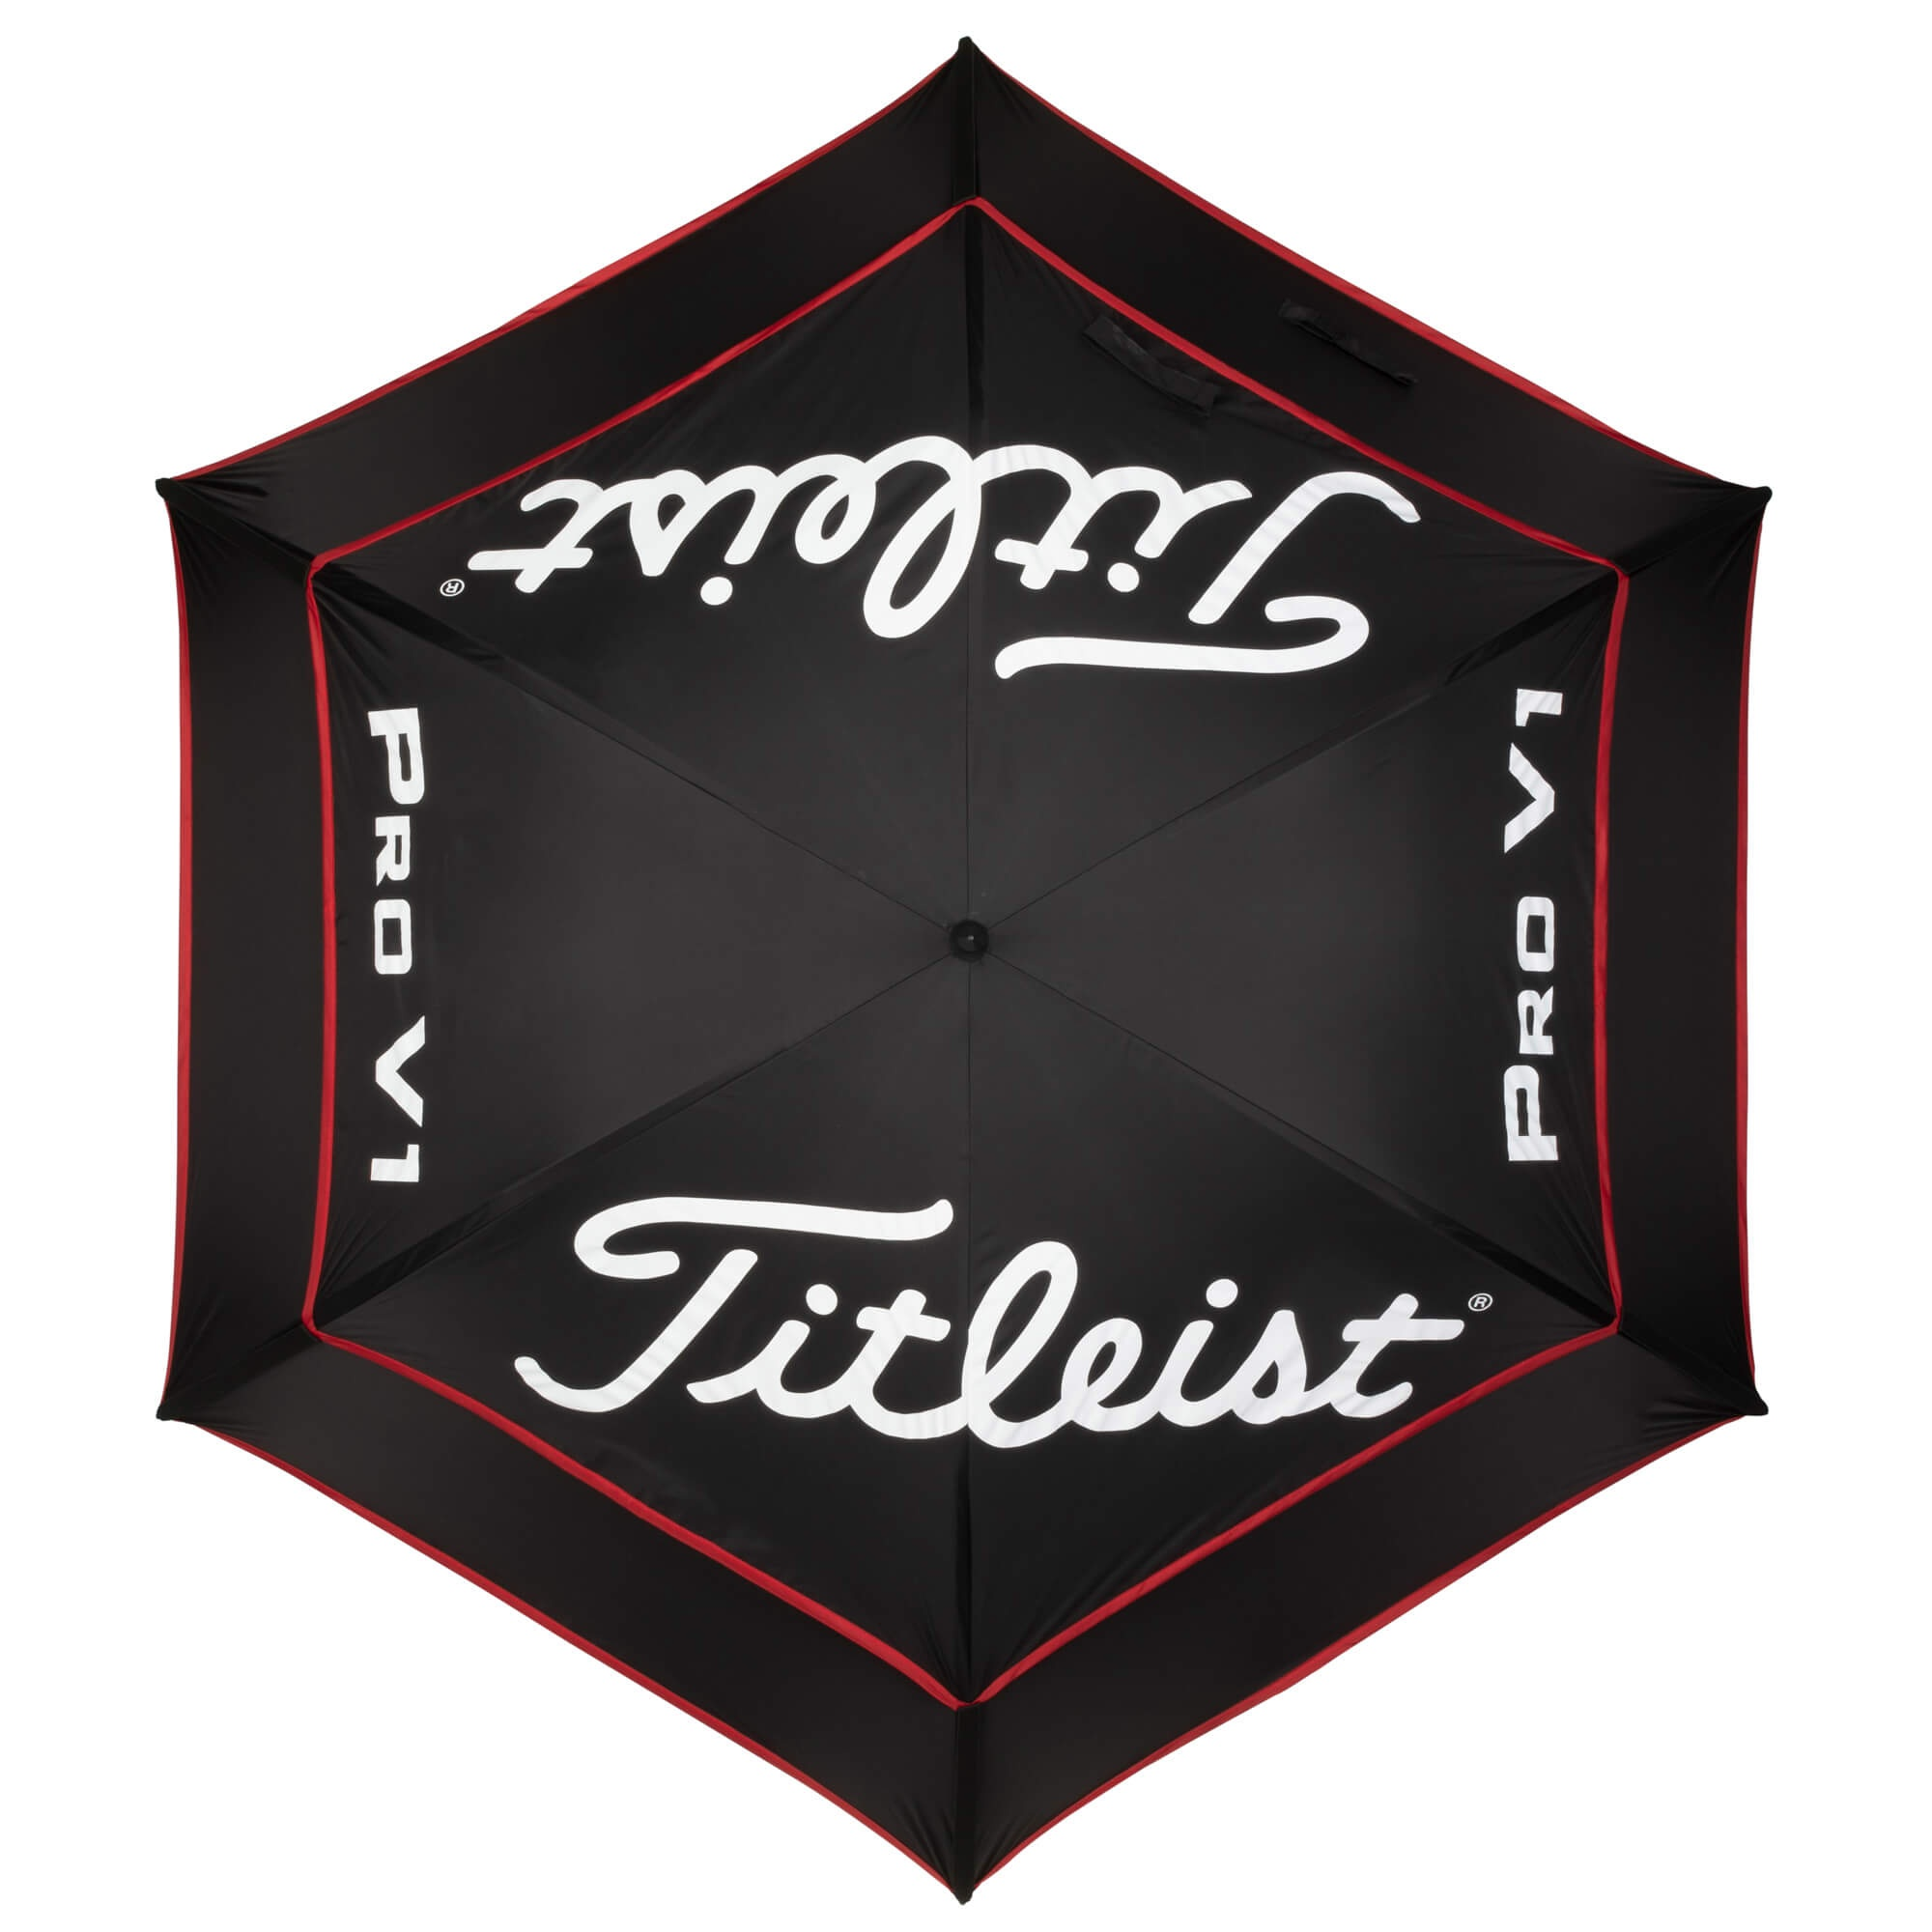 Tour Double Canopy Umbrella